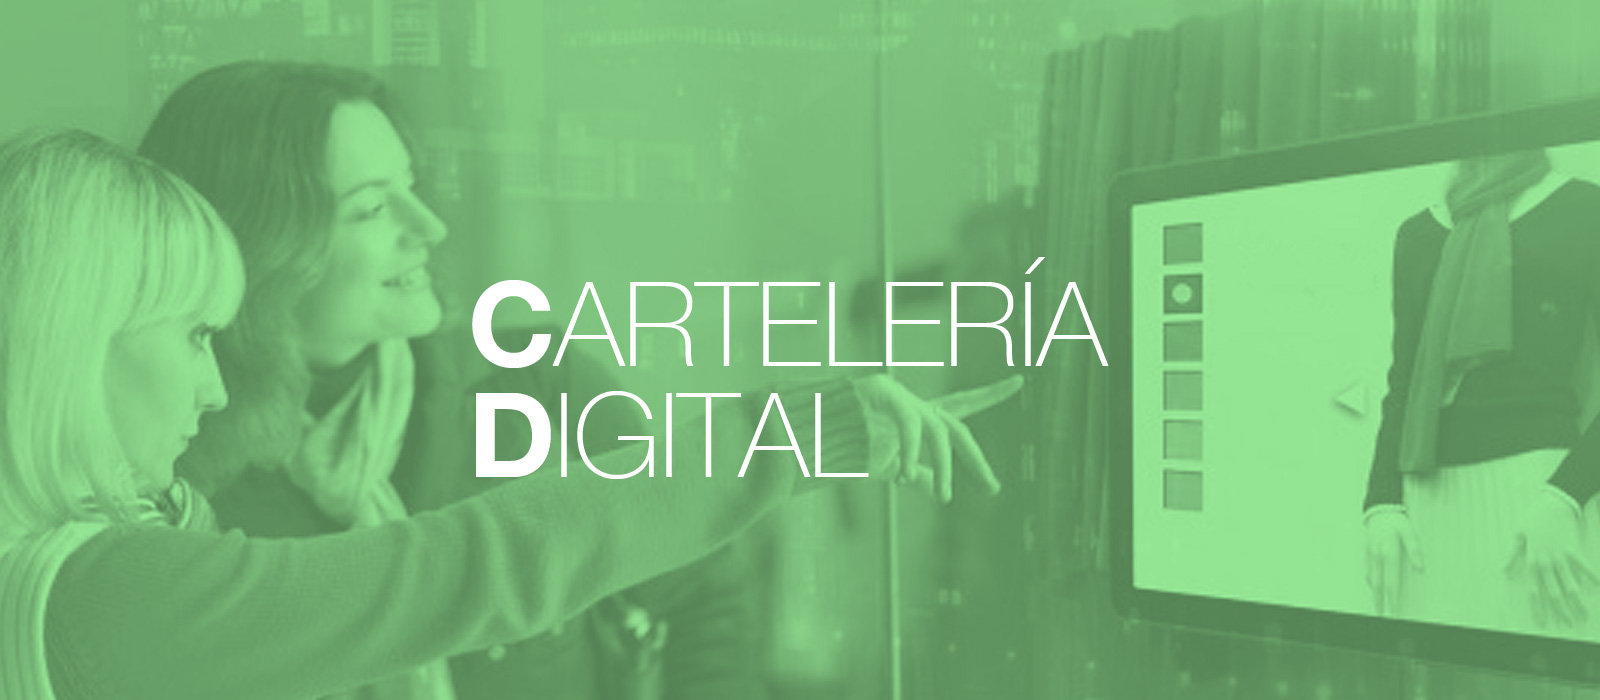 Cartelería Digital Madrid. OmDigital servicio integral.